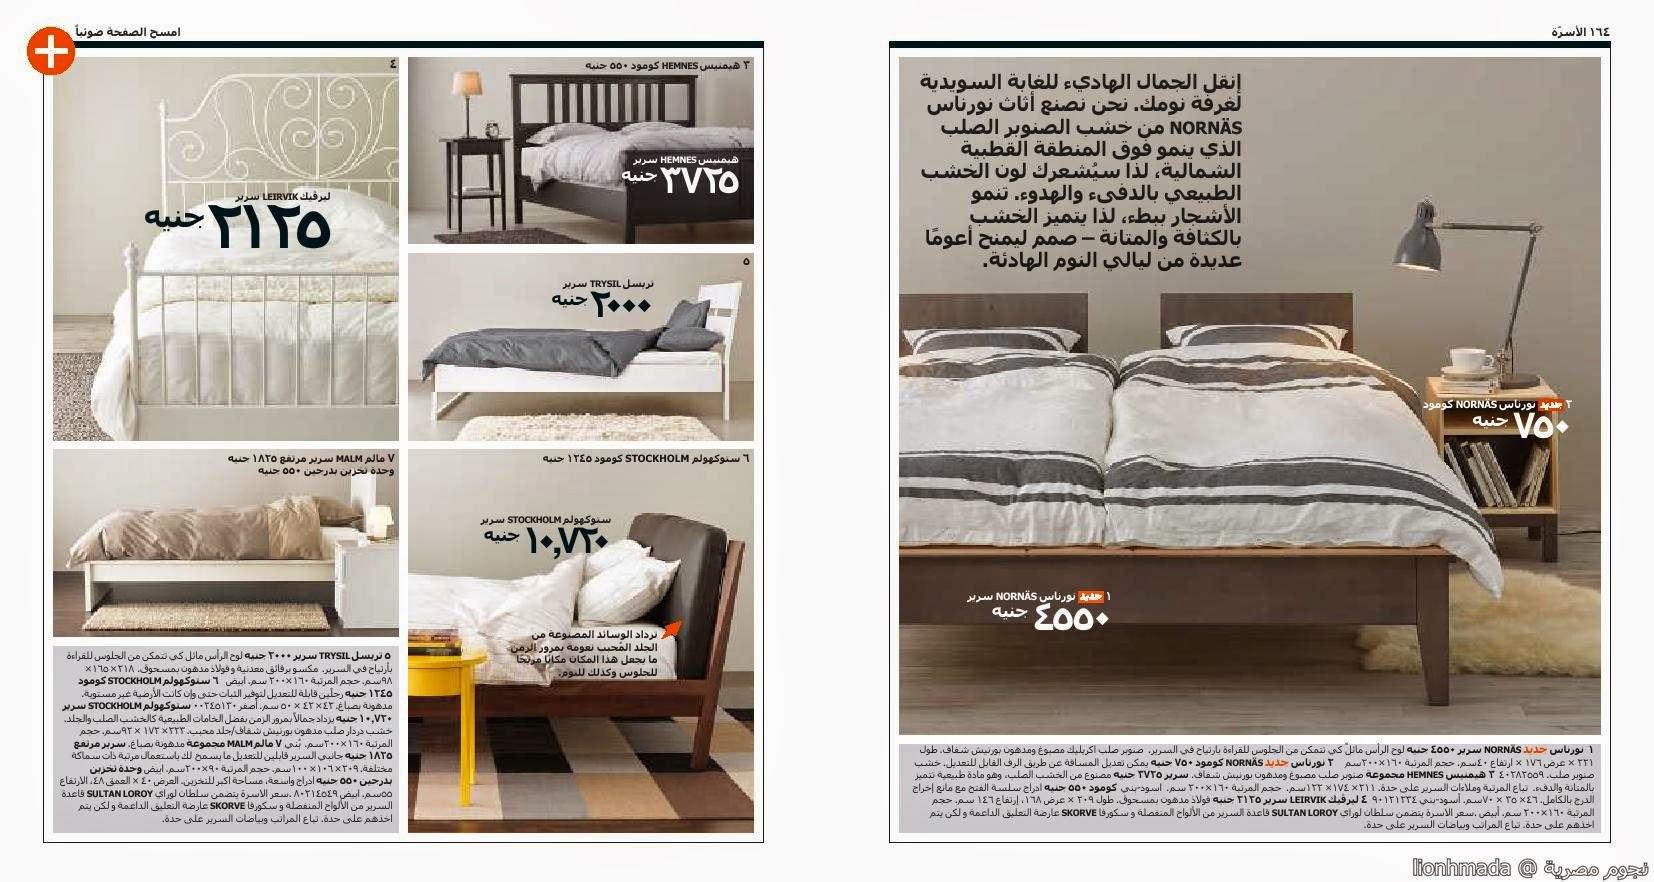 img0712a42d38ff7f3784ca4c5ee401acb7 صور كتالوج ايكيا مصر ikia للديكورات